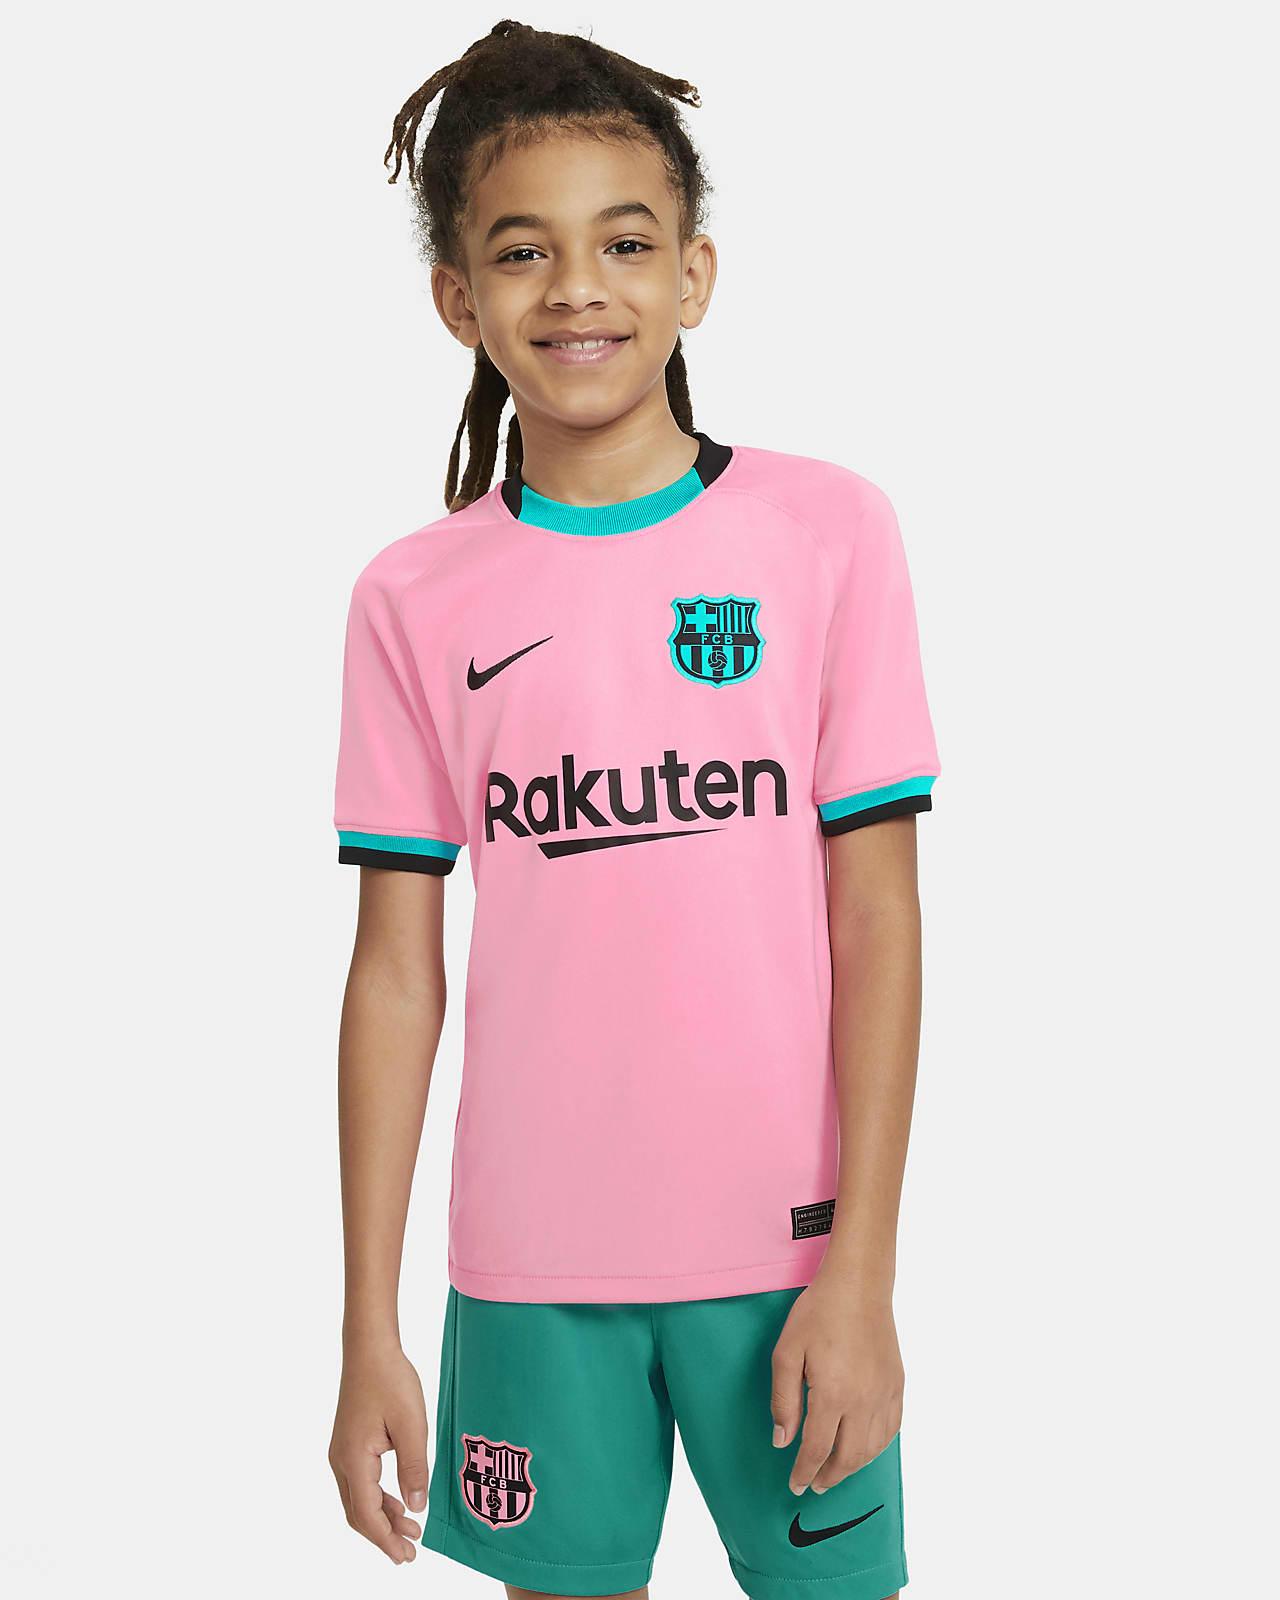 fc barcelona 2020 21 stadium third big kids soccer jersey nike com fc barcelona 2020 21 stadium third big kids soccer jersey